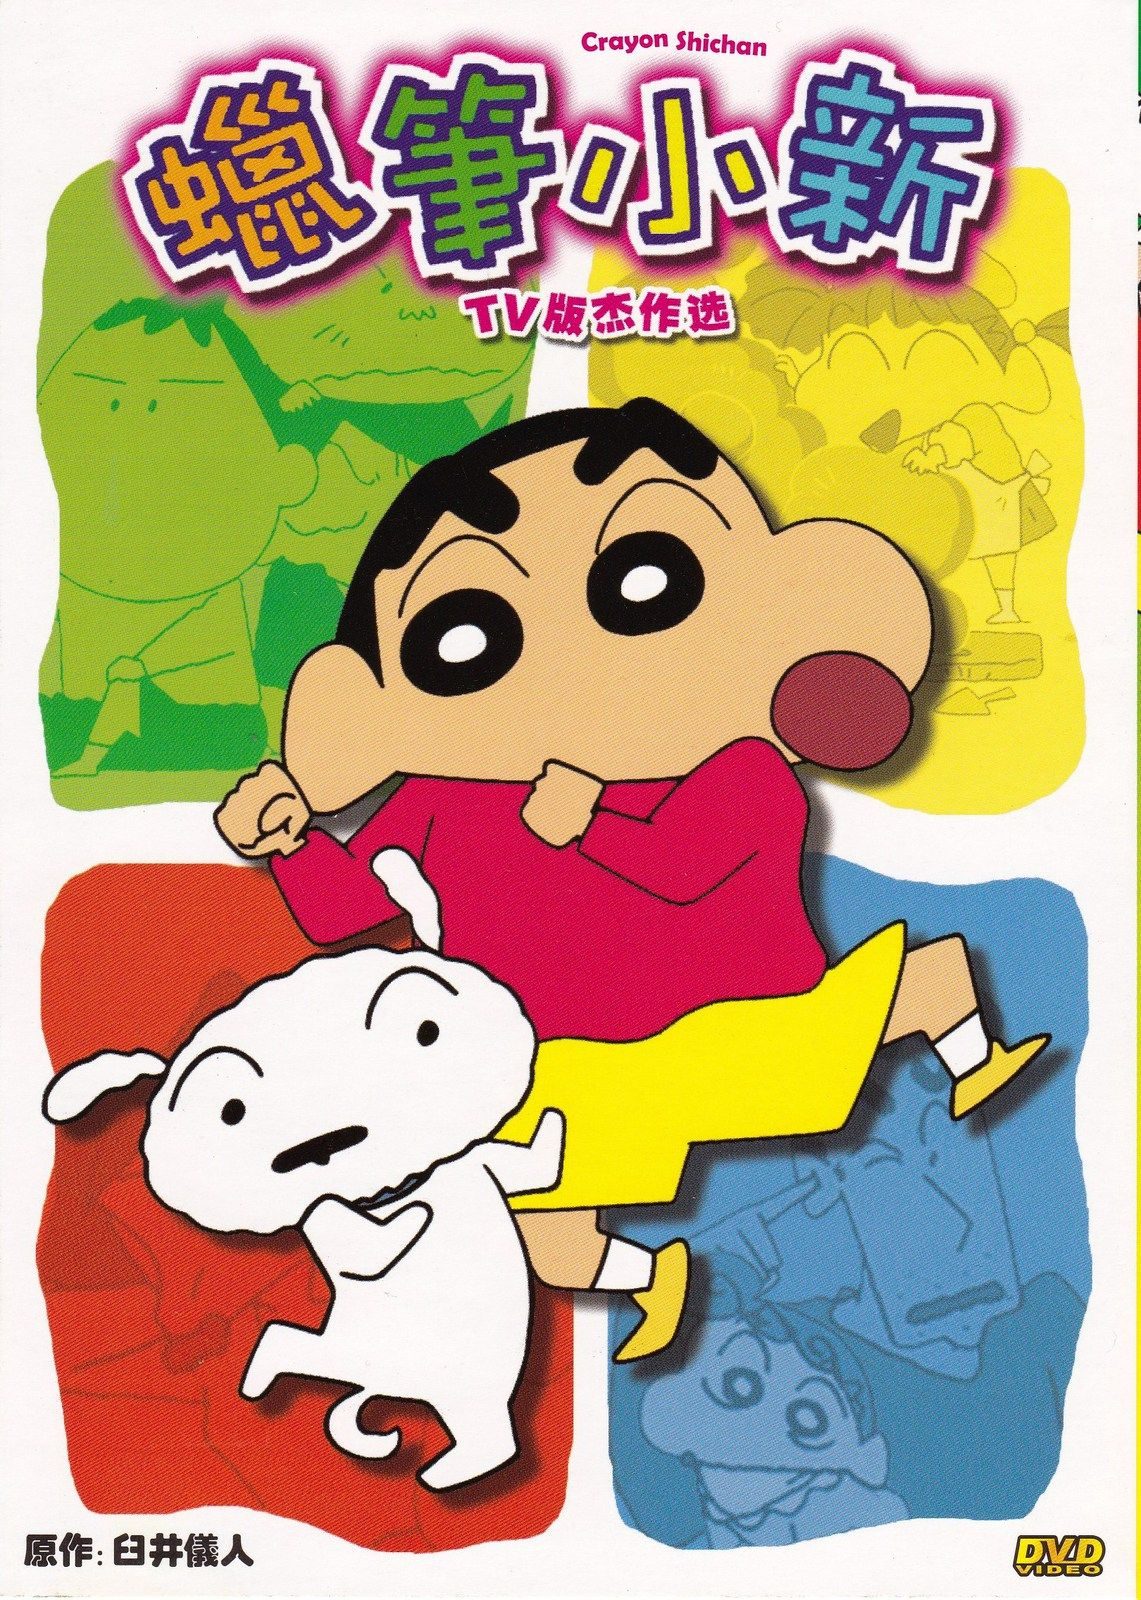 Dvd anime crayon shin chan tv series 60 episodes region